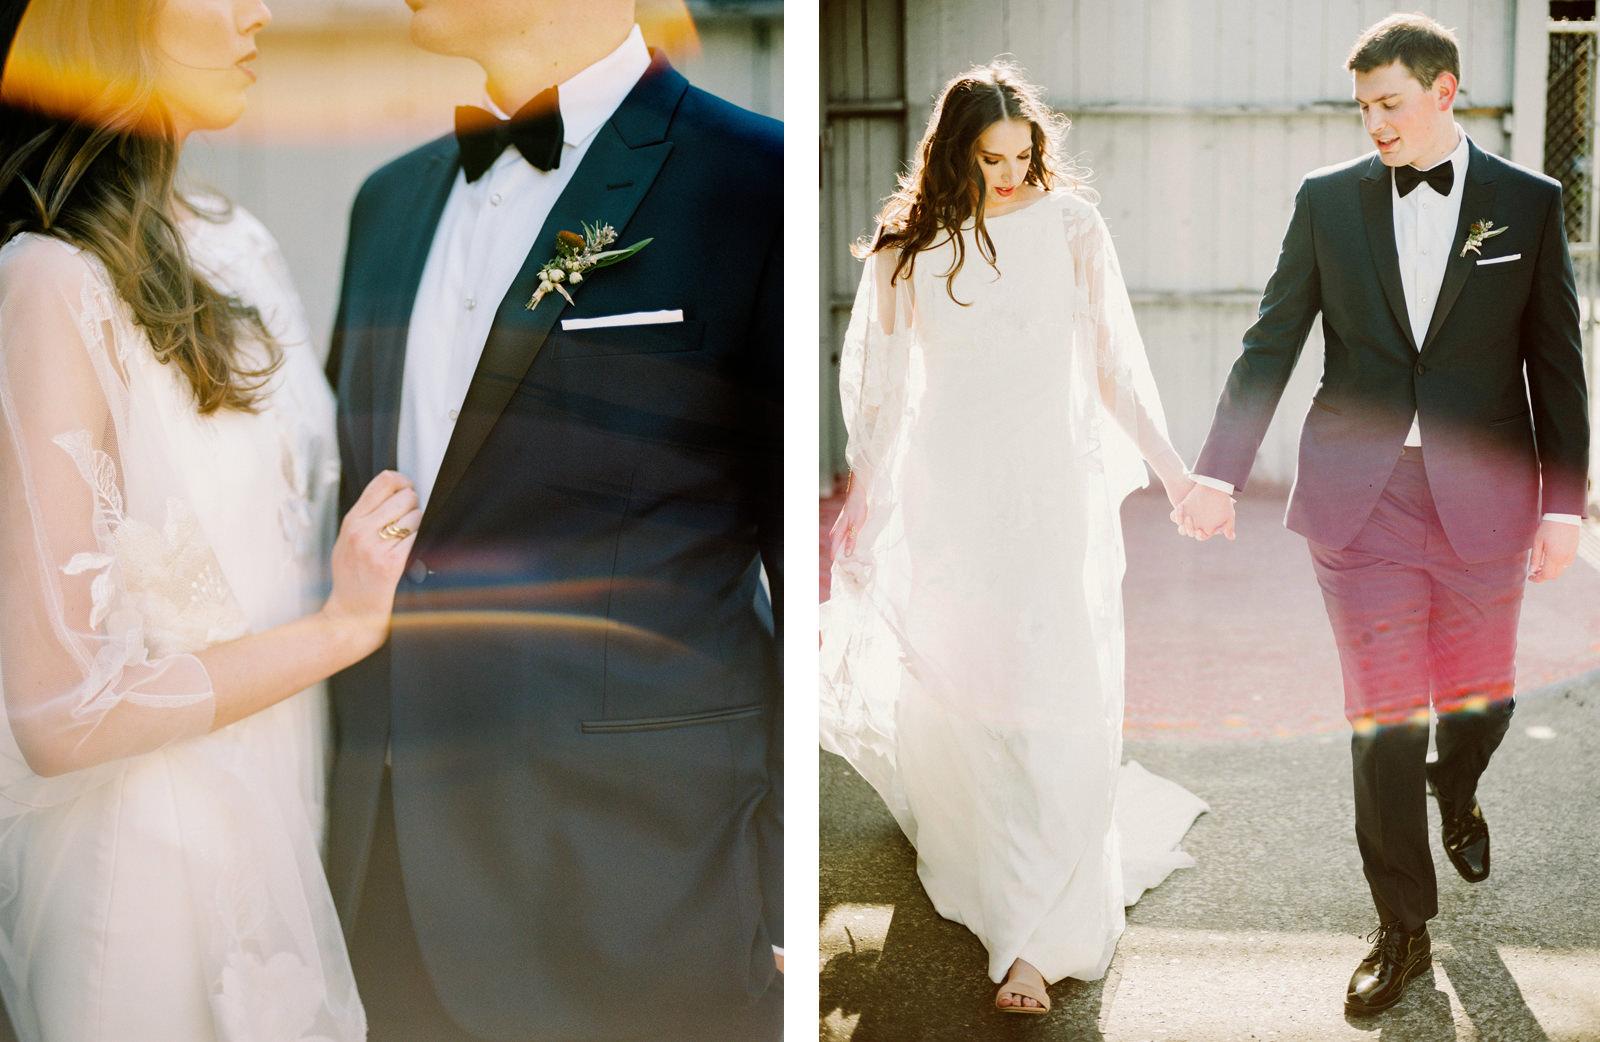 sodo-park-wedding-056 SODO PARK WEDDING